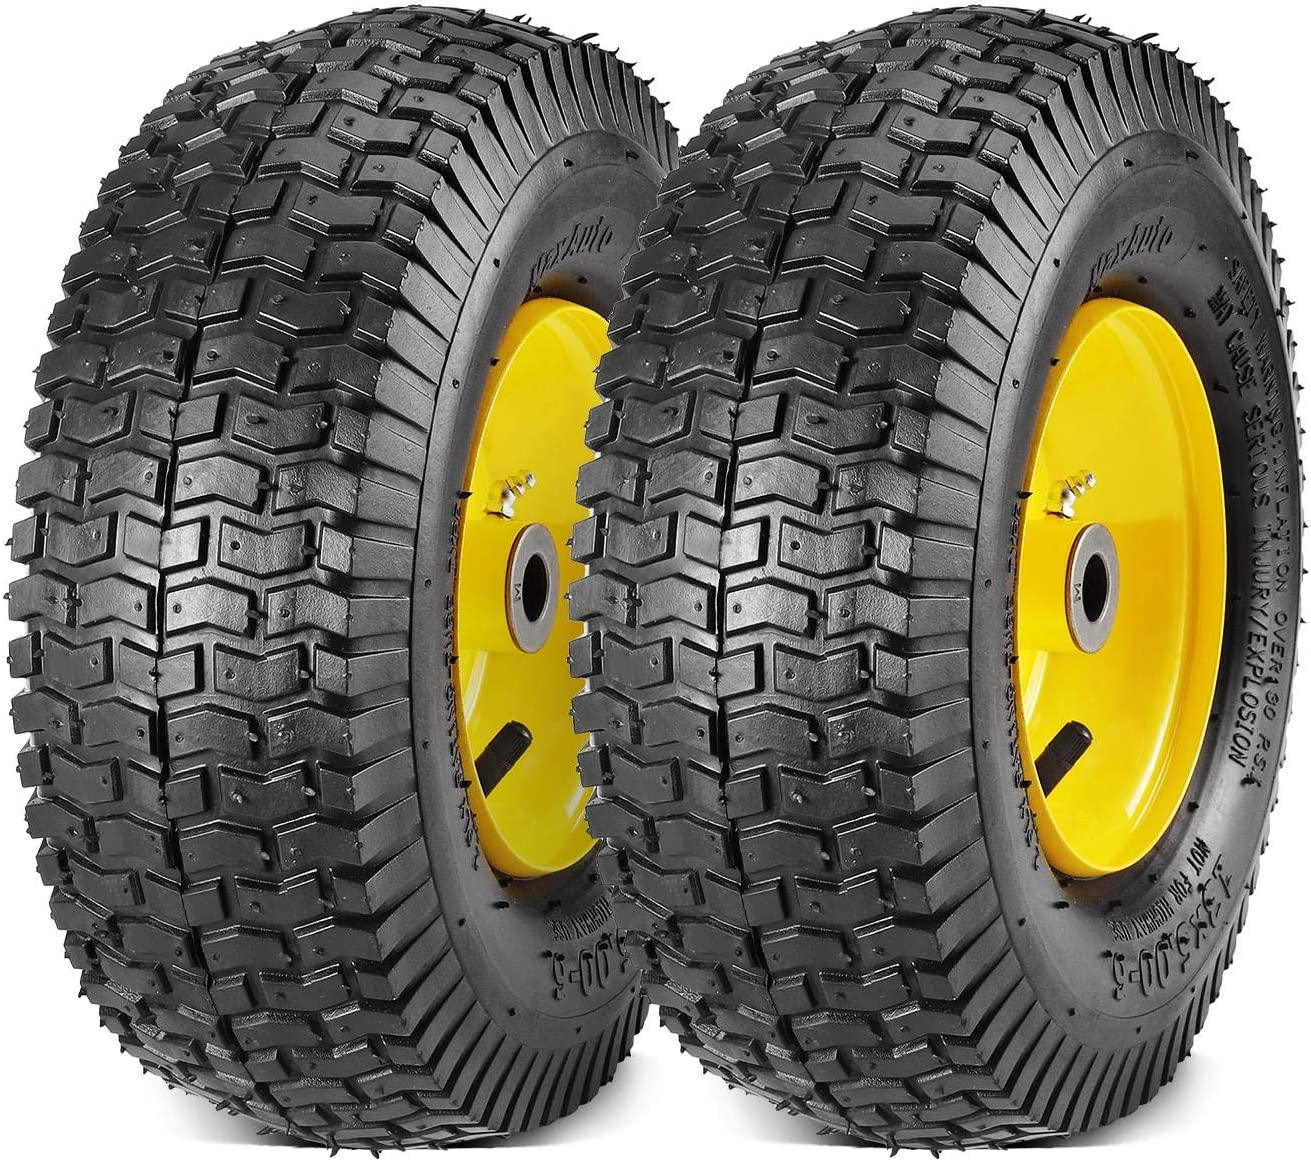 MaxAuto 2-Pack 13x5.00-6 2PLY Turf Mower Tractor Tire with Yellow Rim, (3